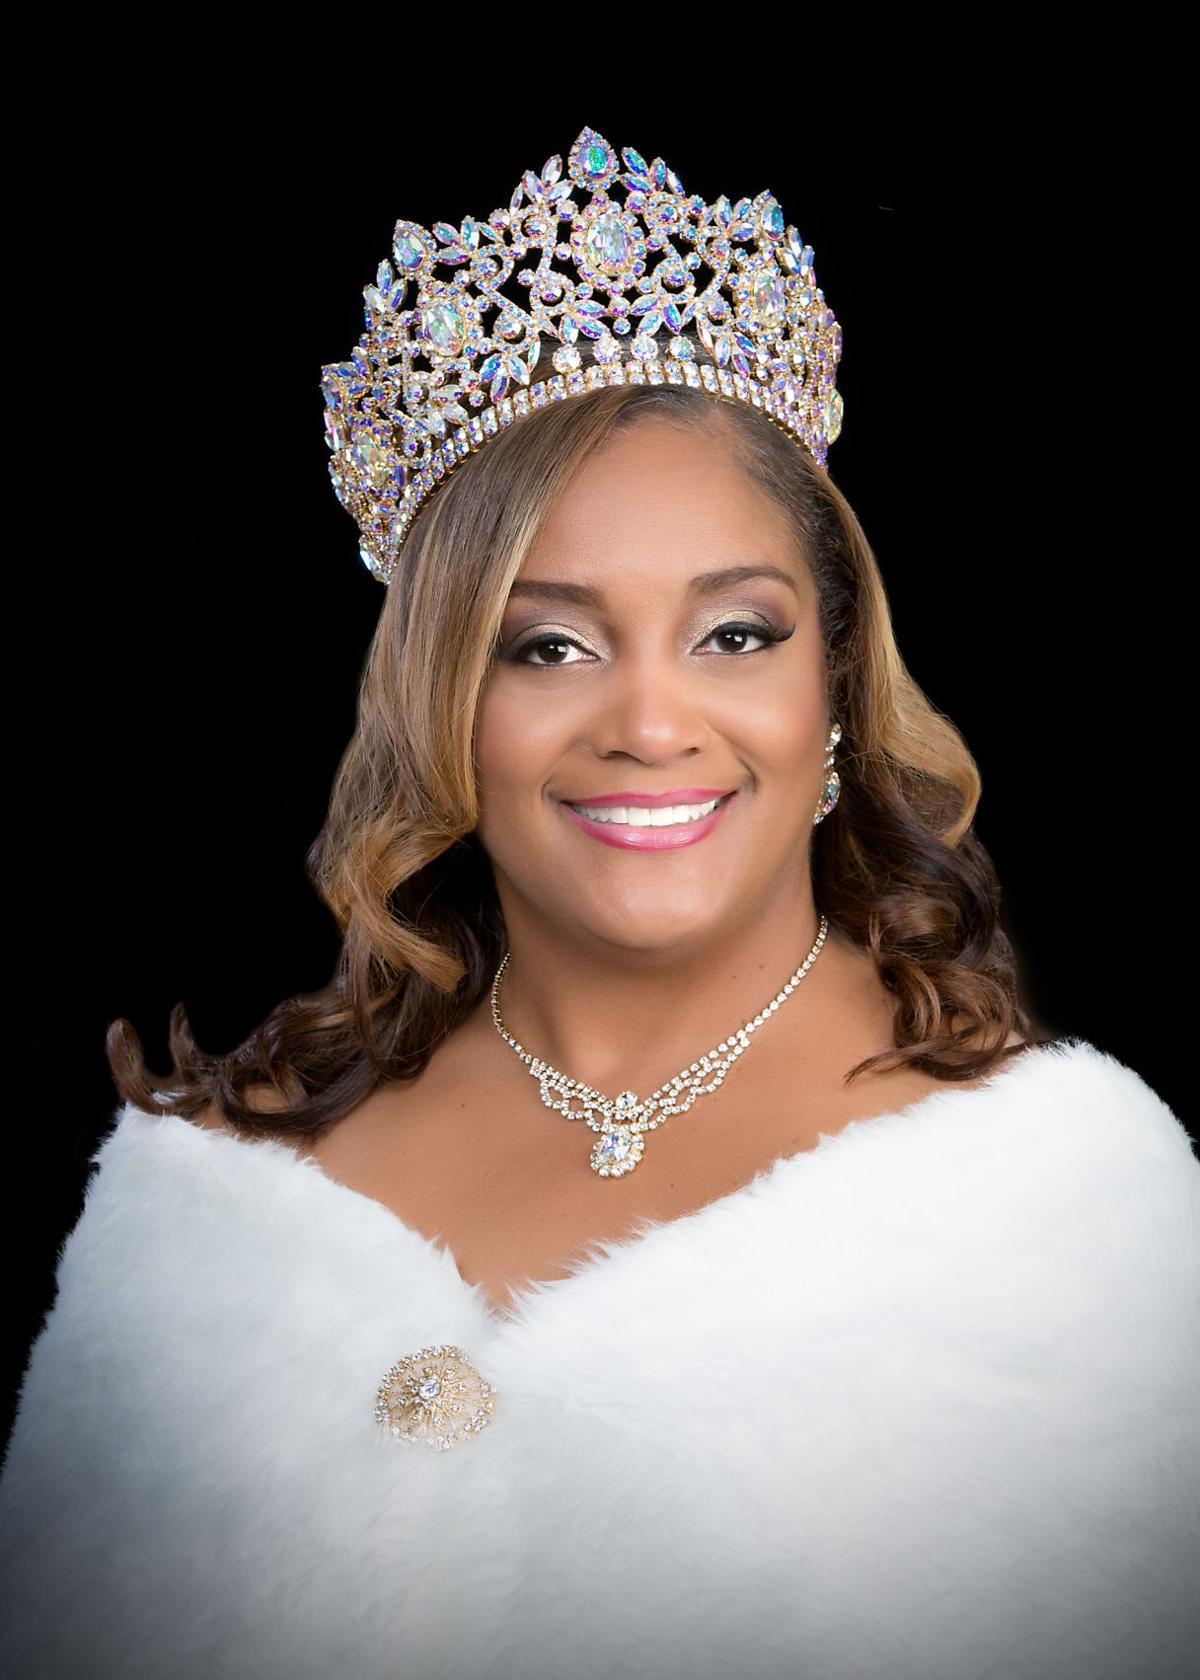 MKFF Queen Kimberly Prater-McPherson.jpg